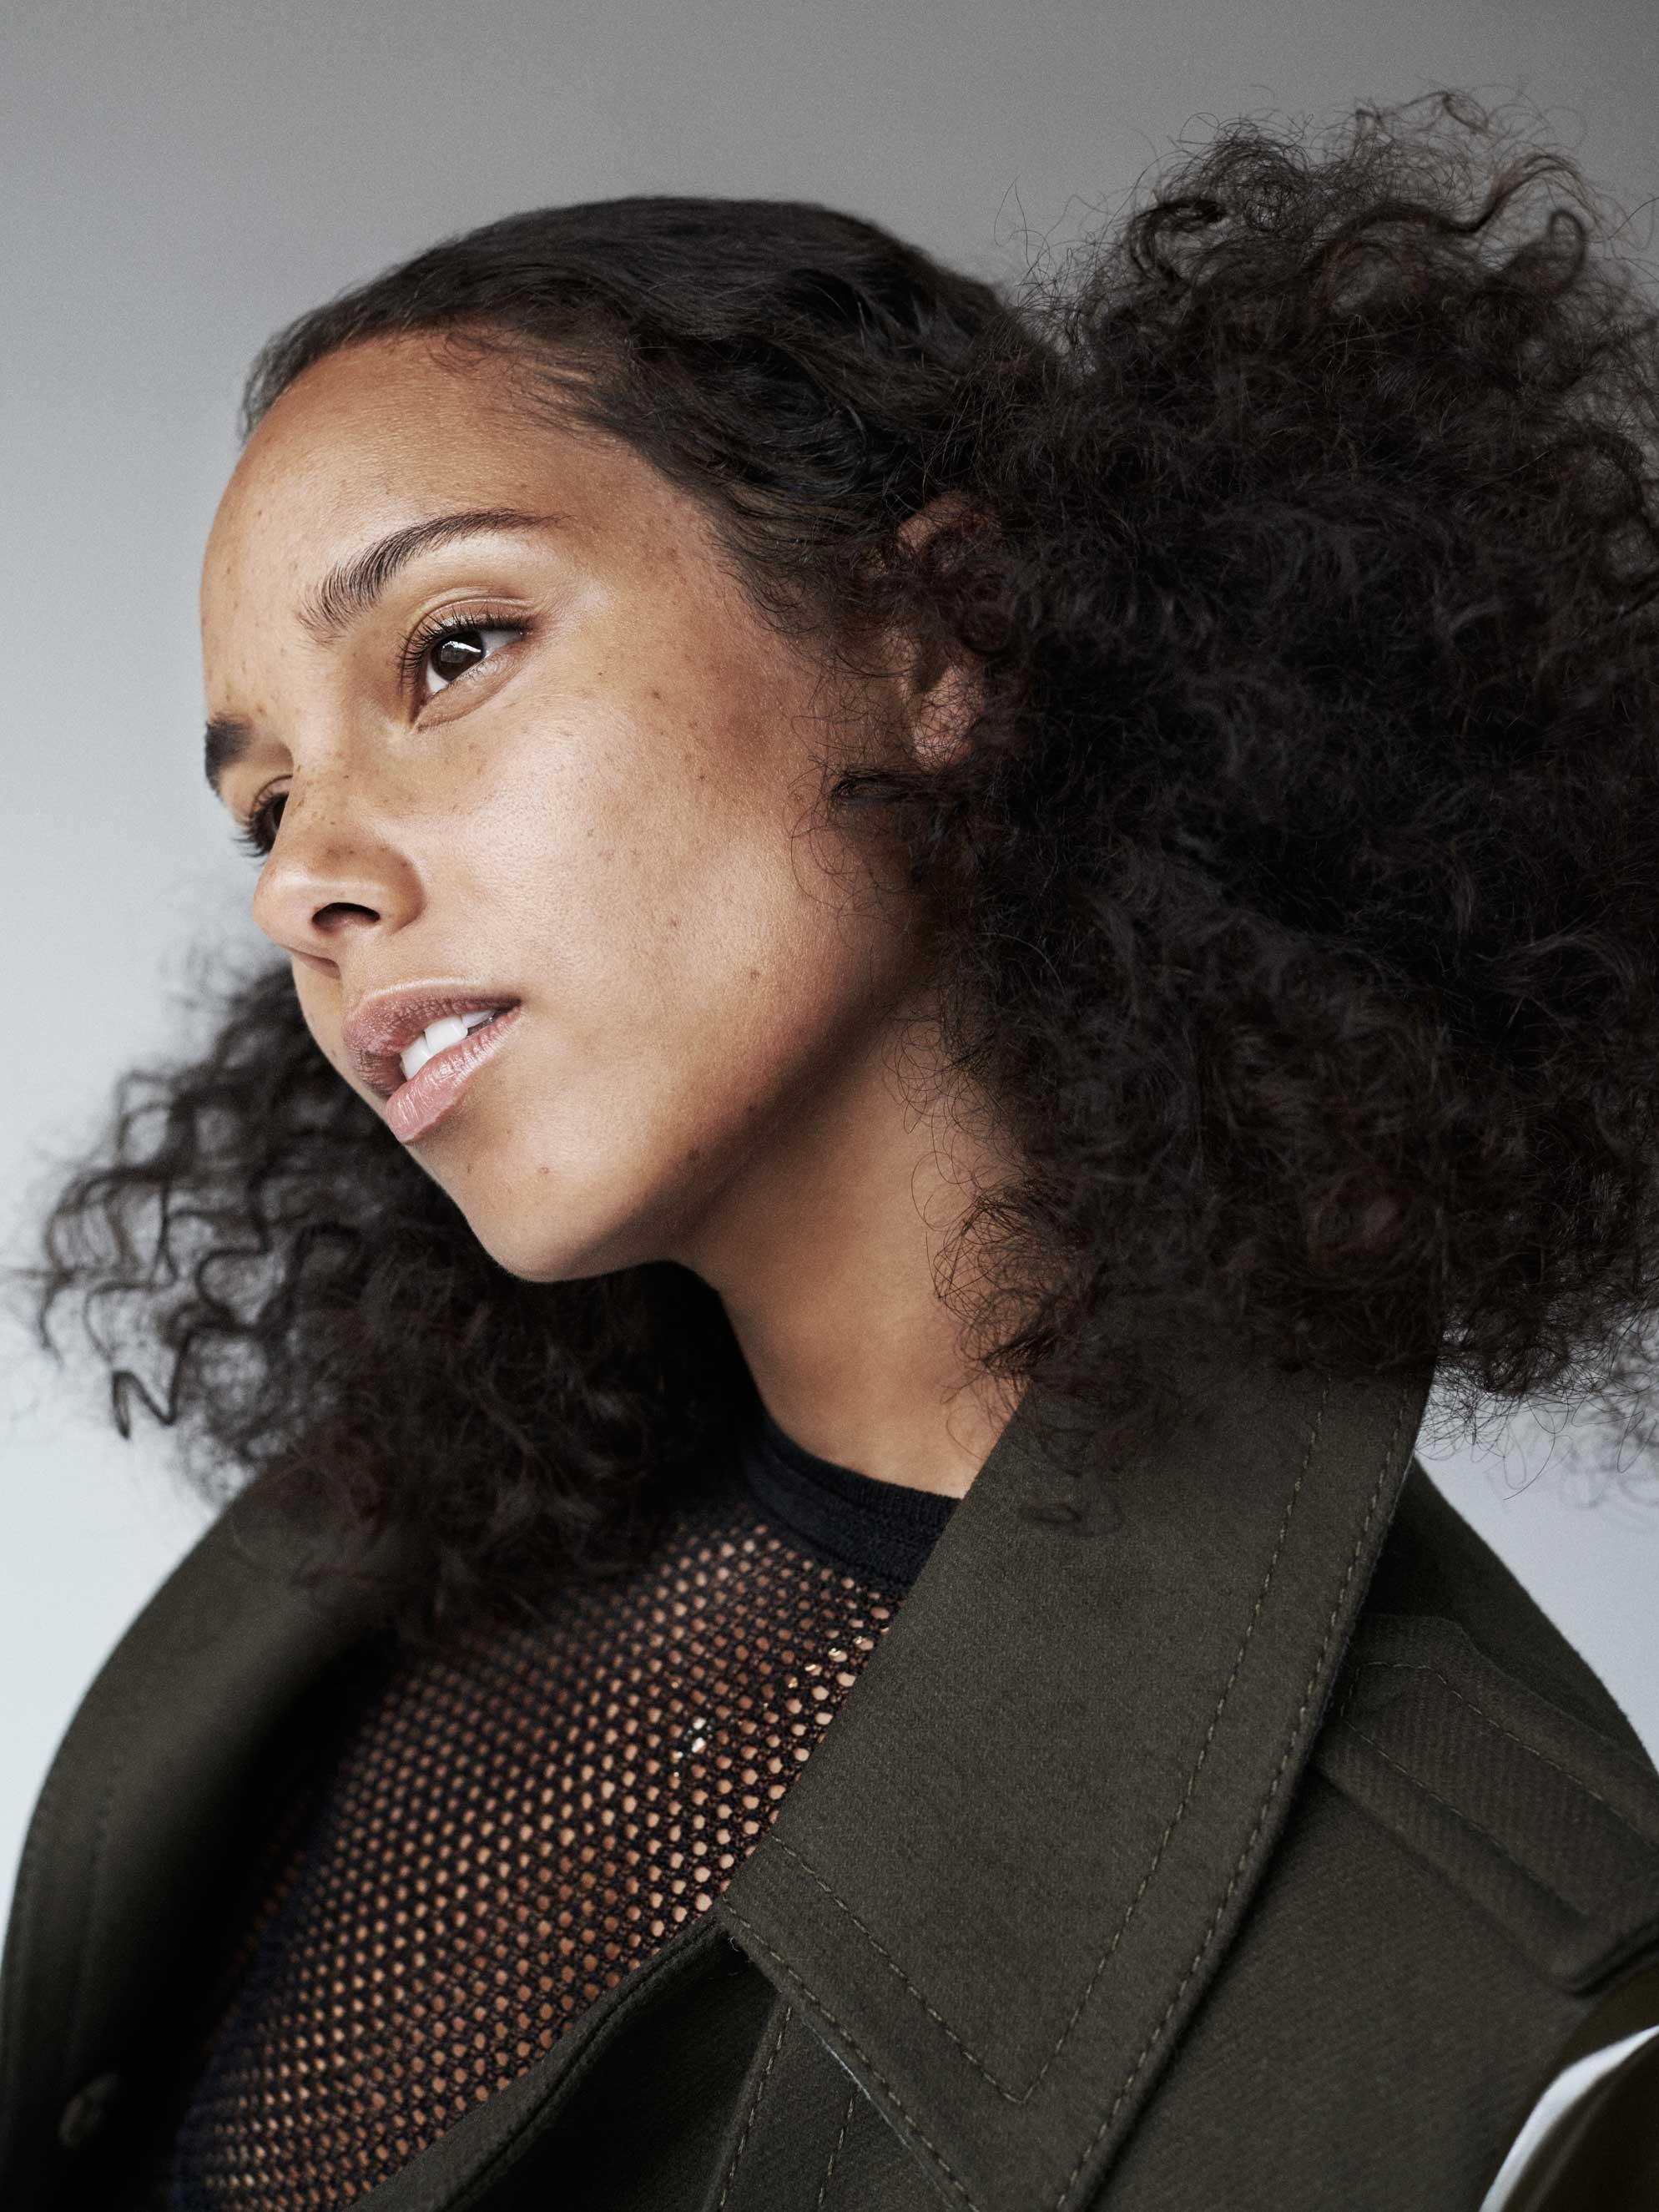 Portrait of Alicia Keys